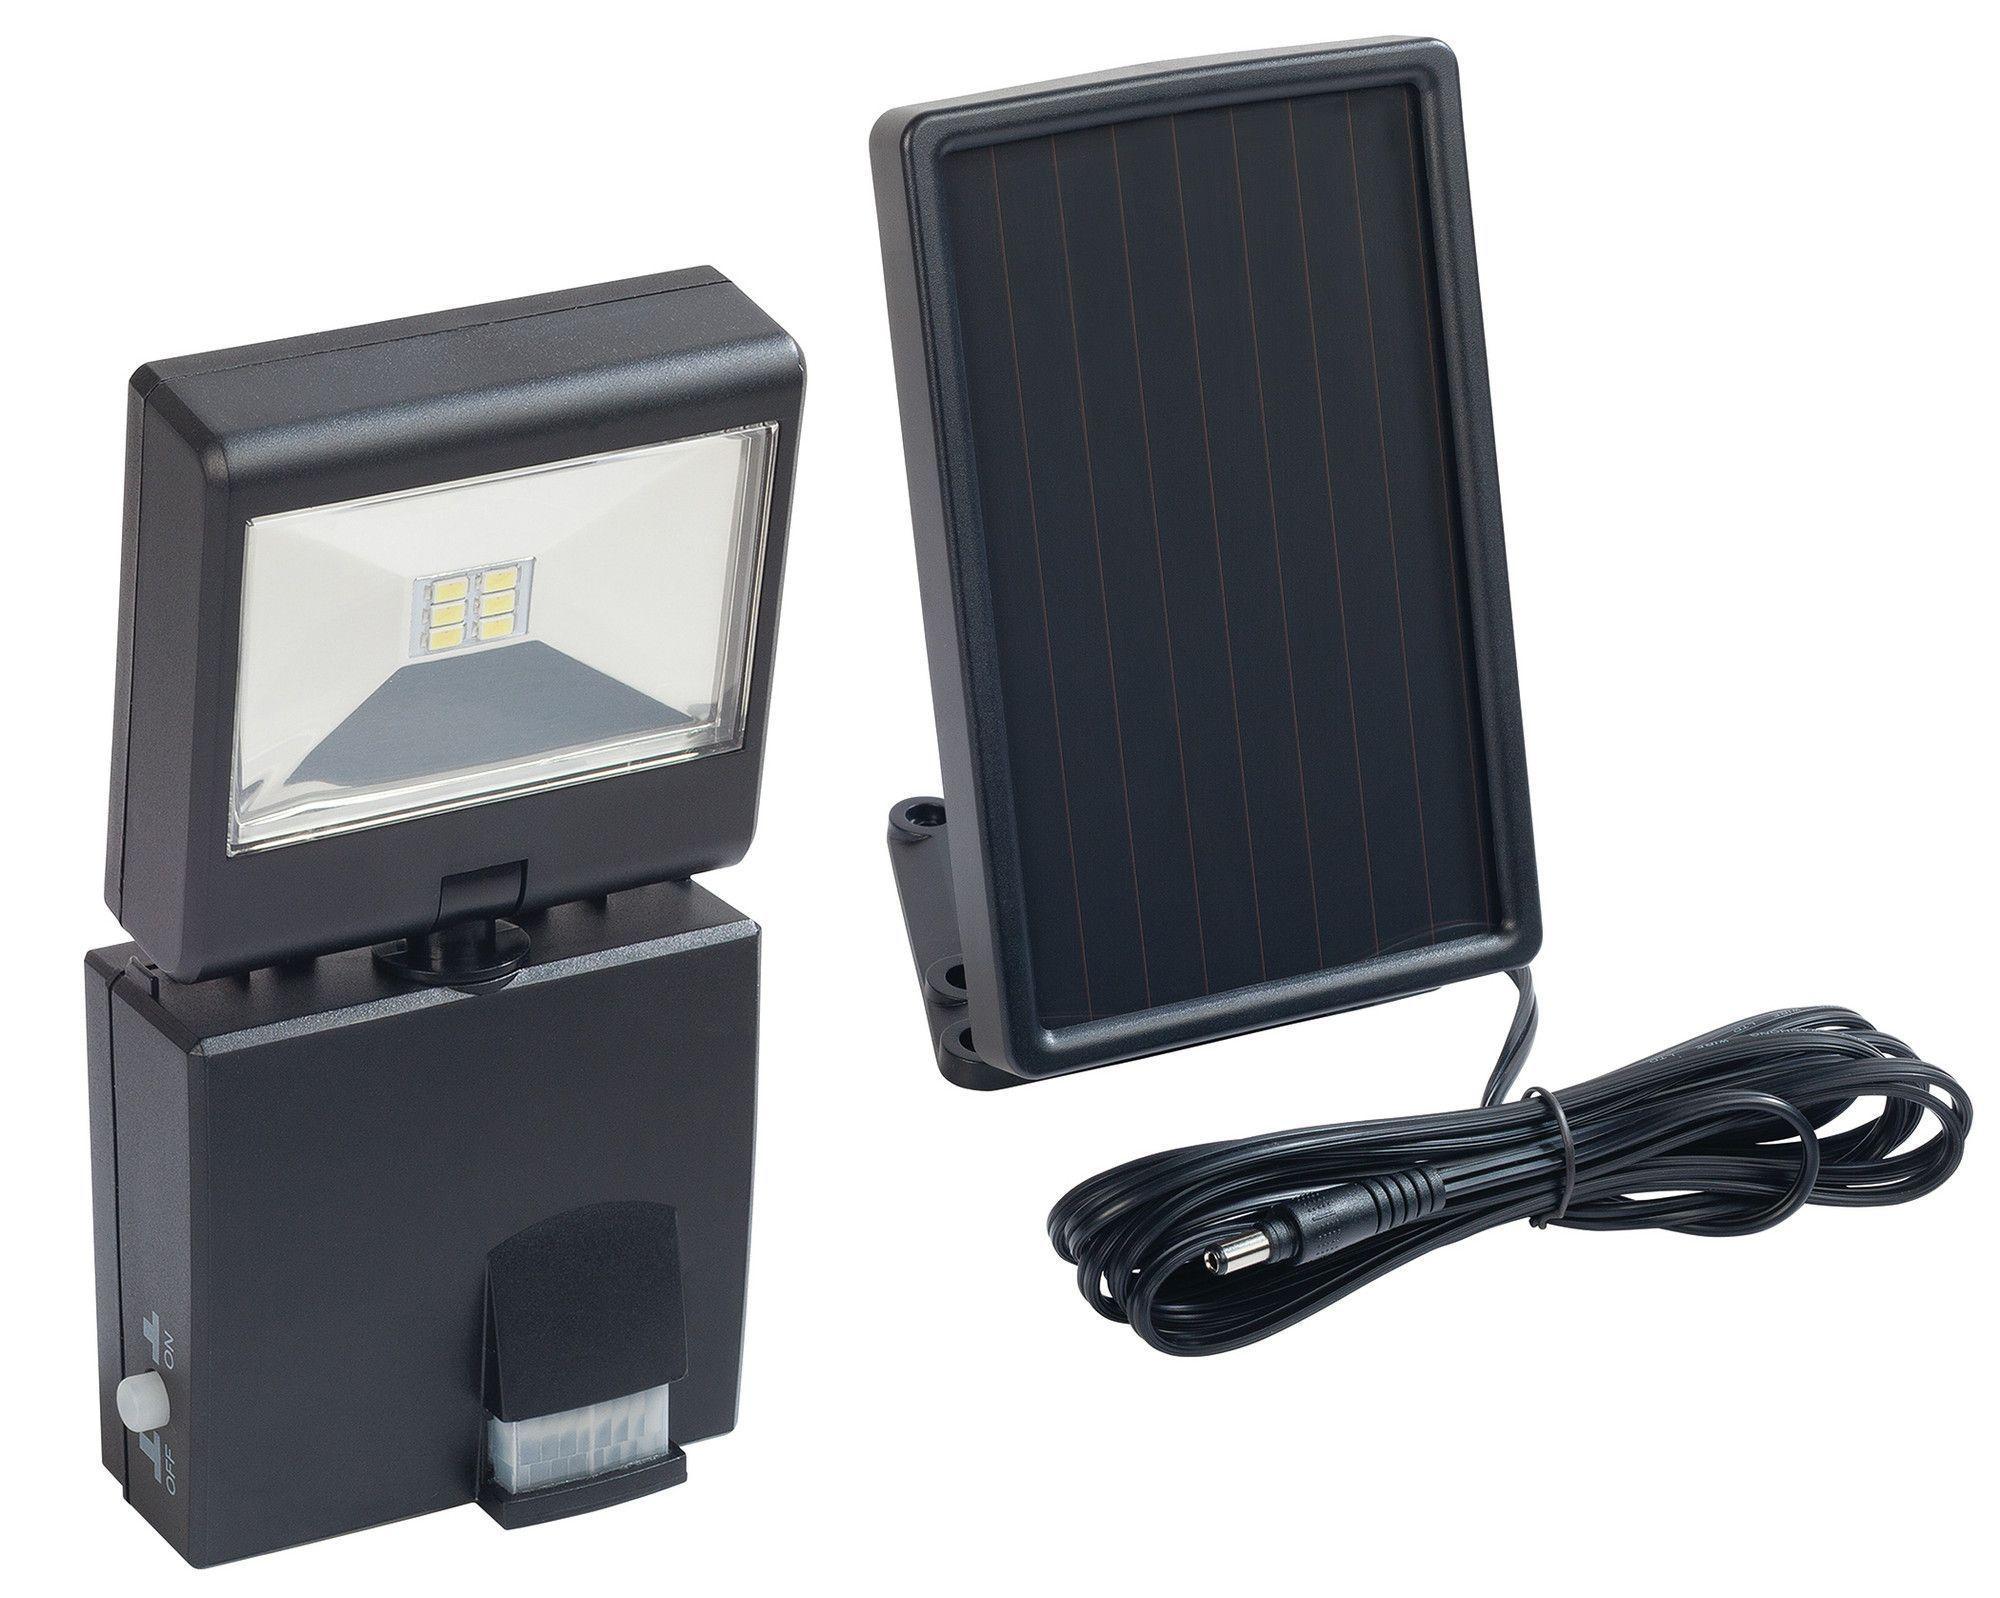 bunker hill solar security light